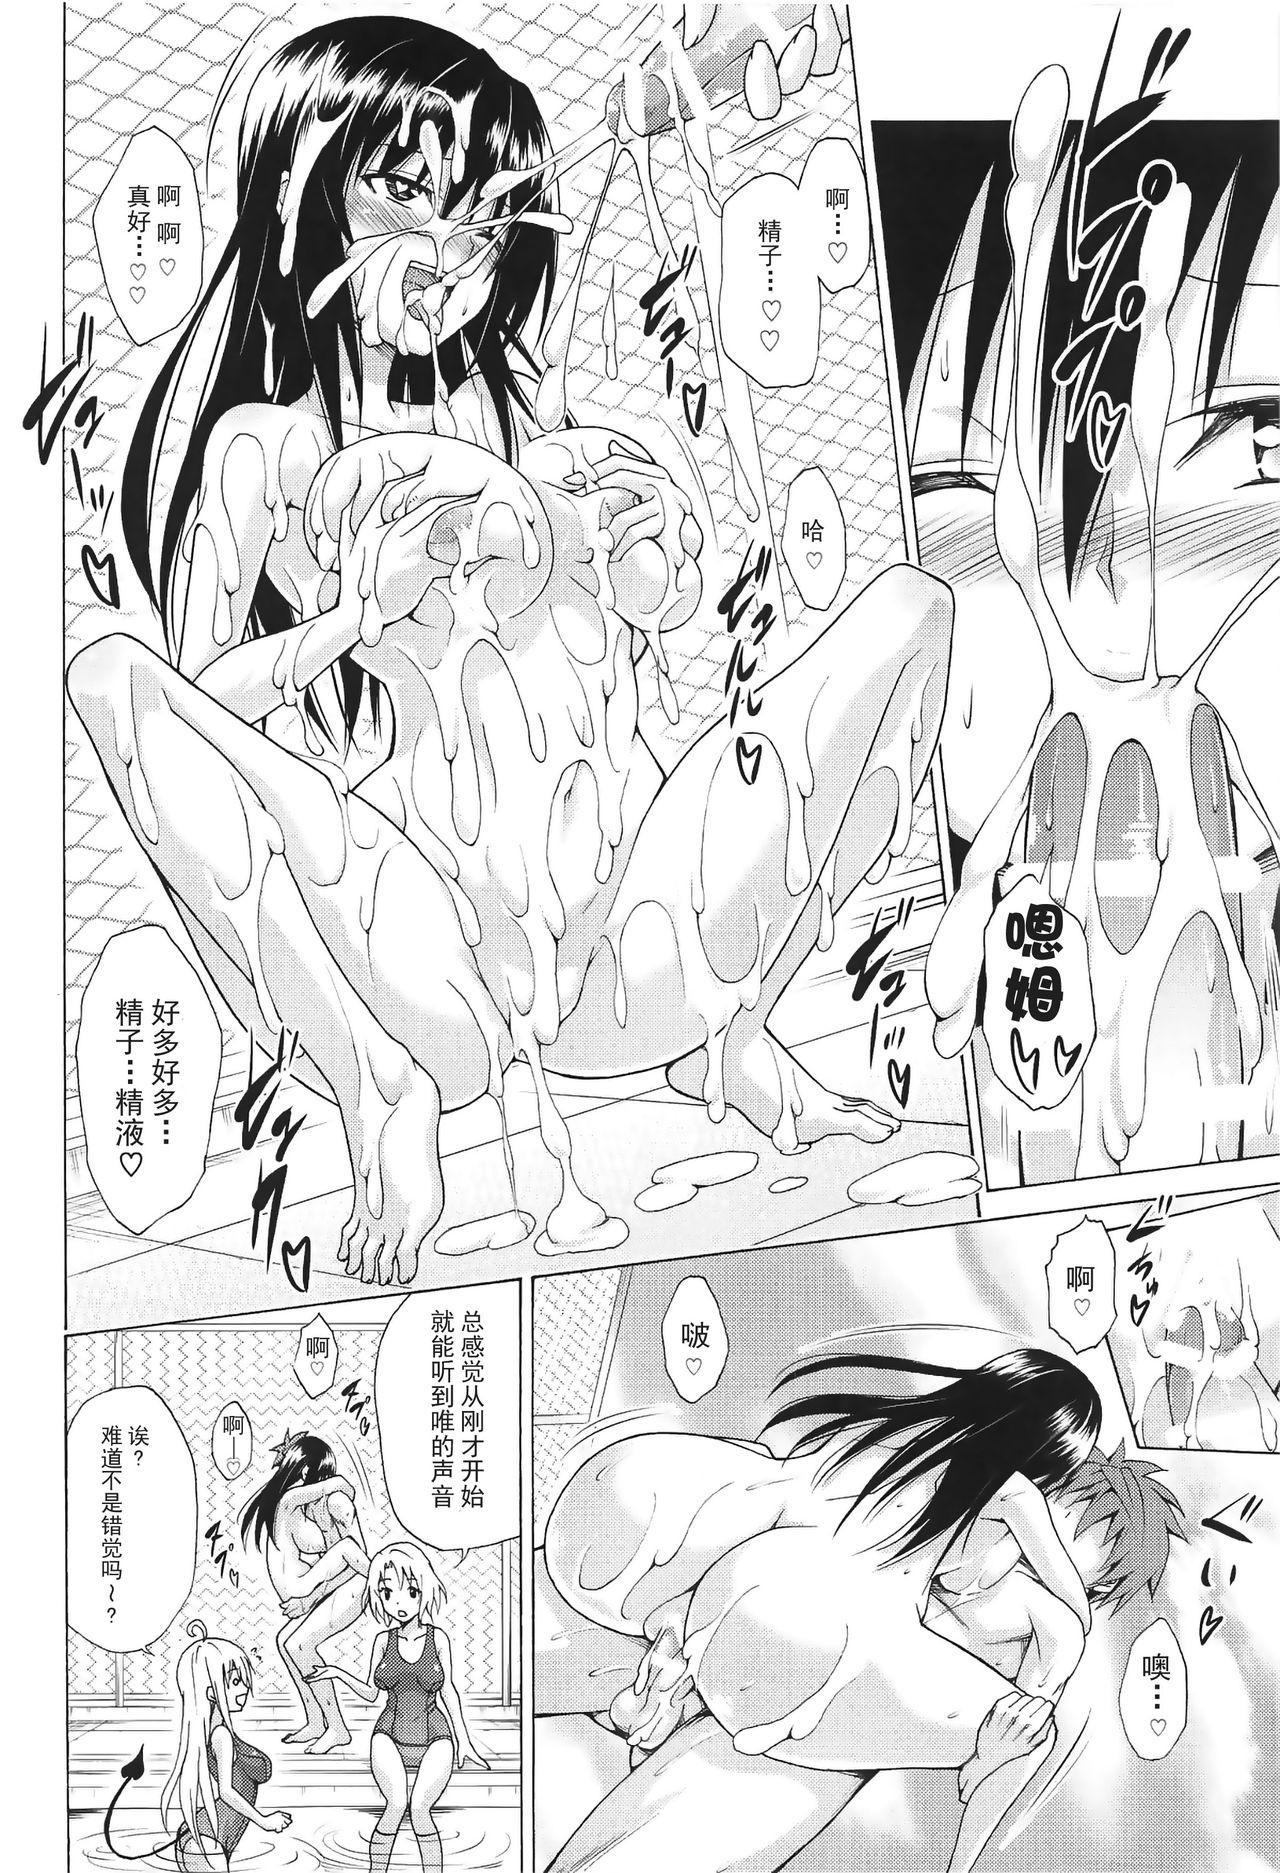 Mezase! Rakuen Keikaku Vol. 5 29